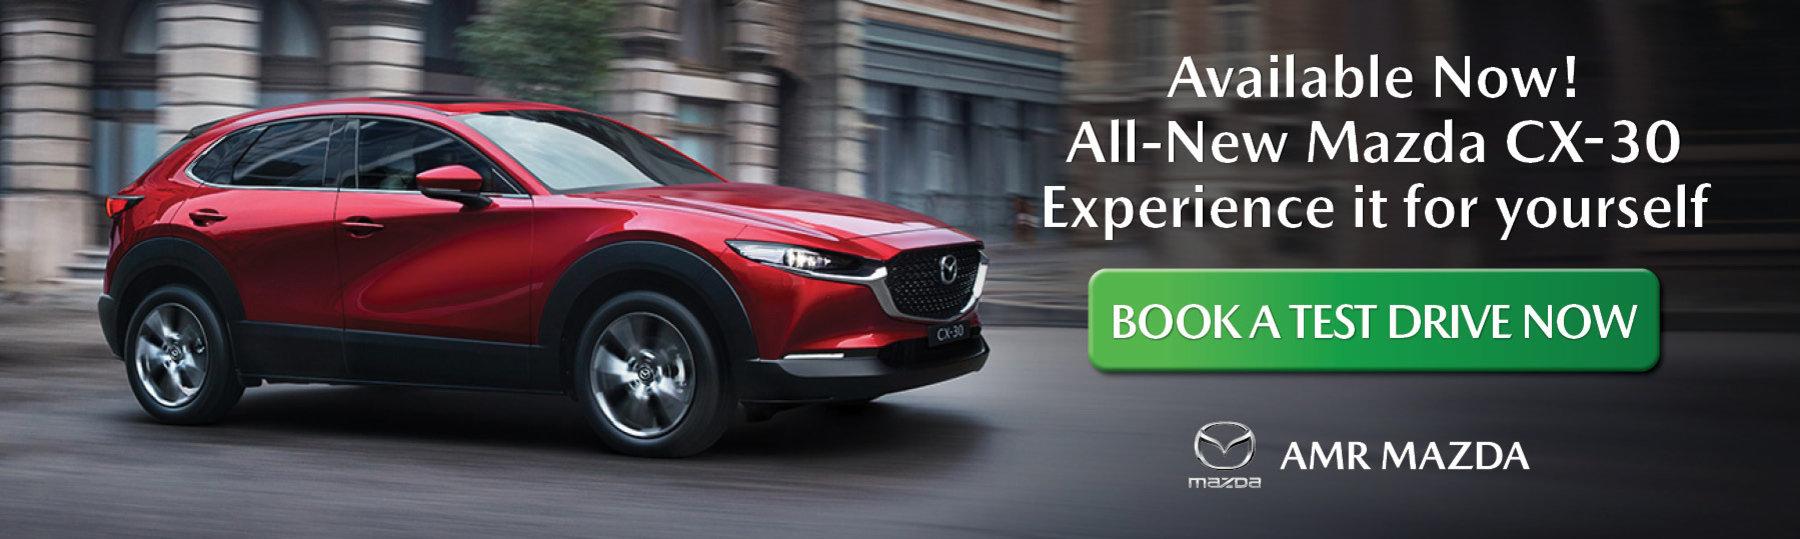 All-New Mazda CX-30 Test Drive